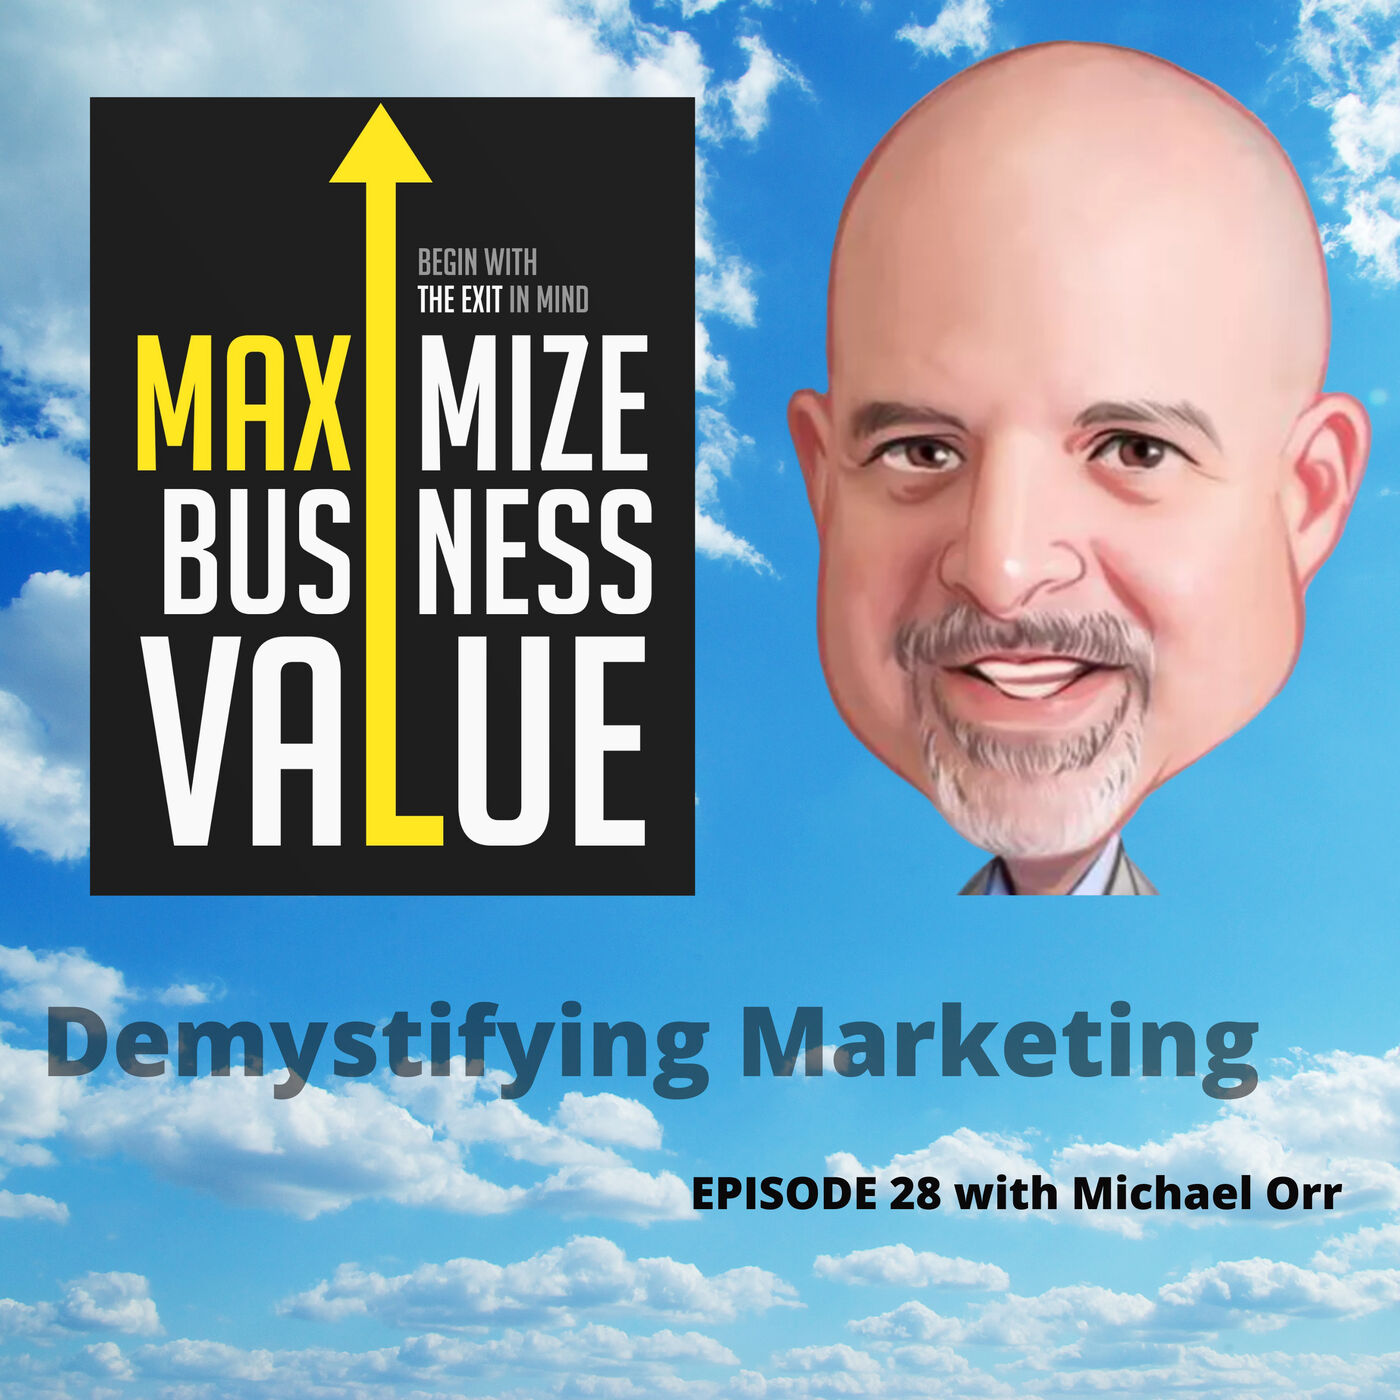 Demystifying Marketing with Michael Orr